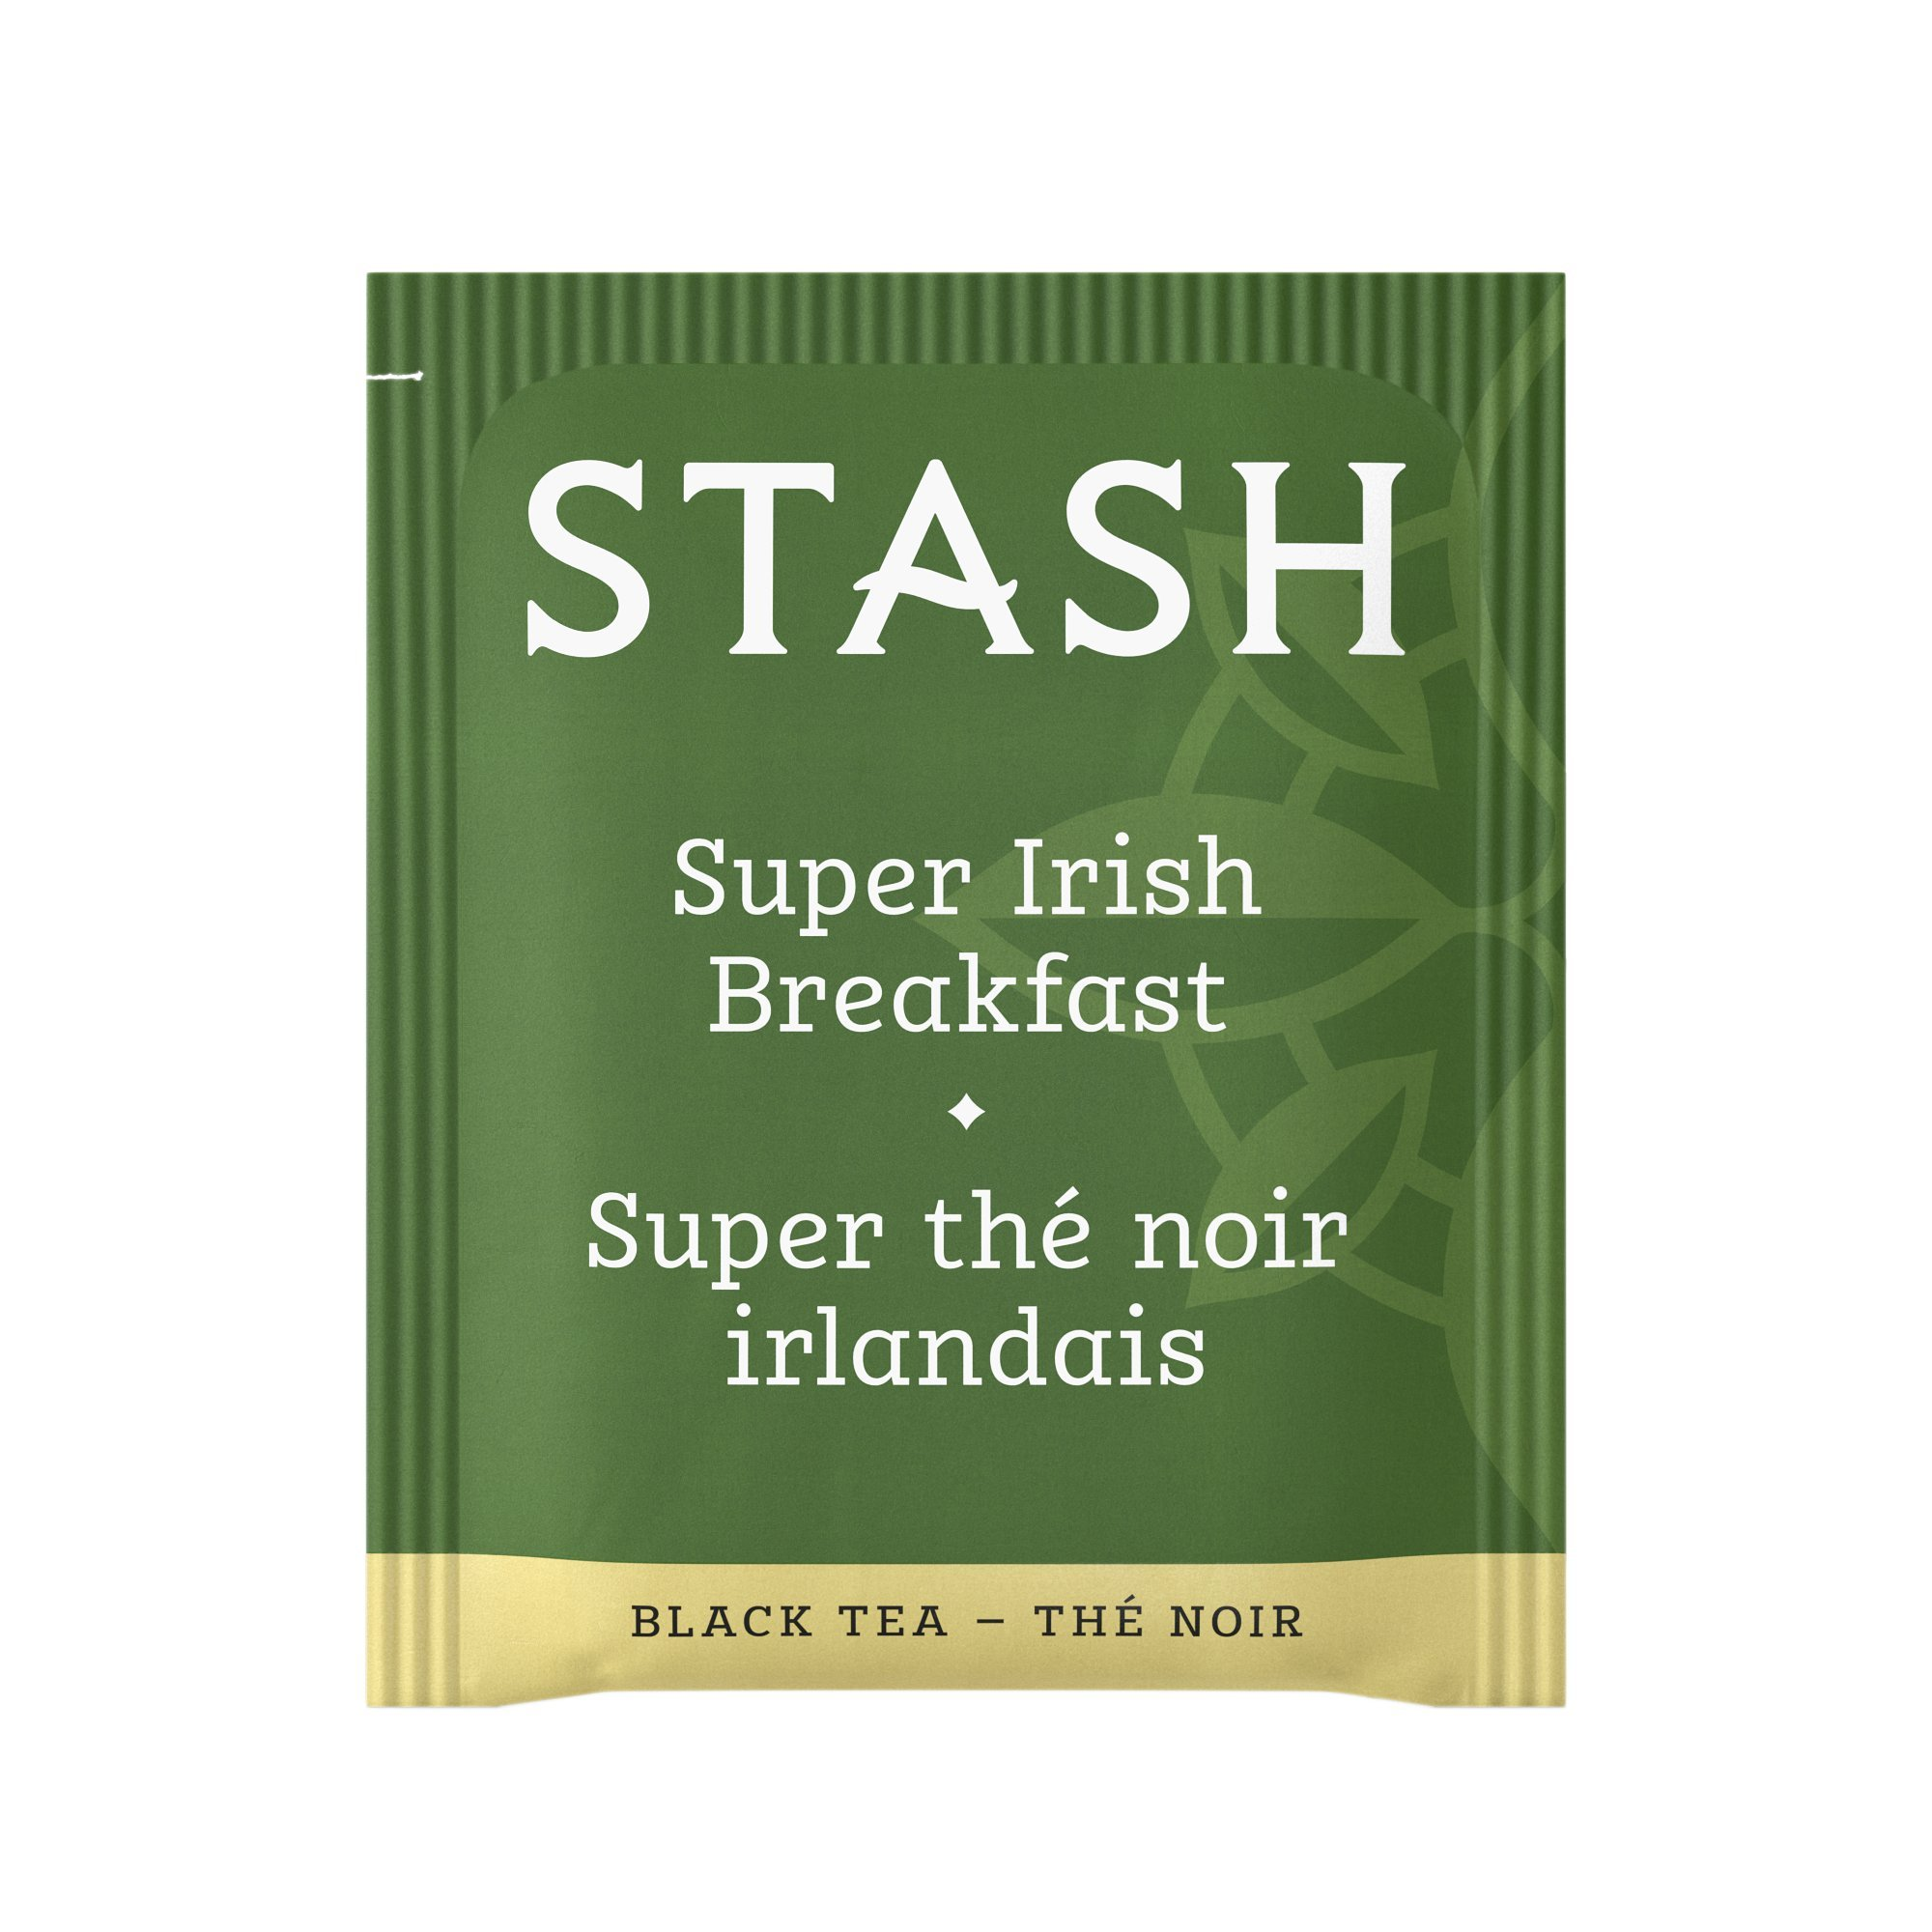 Stash Tea Super Irish Breakfast Black Tea 1000 Tea Bags in 8.8 Pound Box Individual Black Tea Bags for Use in Teapots Mugs or Cups, Brew Hot Tea or Iced Tea by Stash Tea (Image #3)